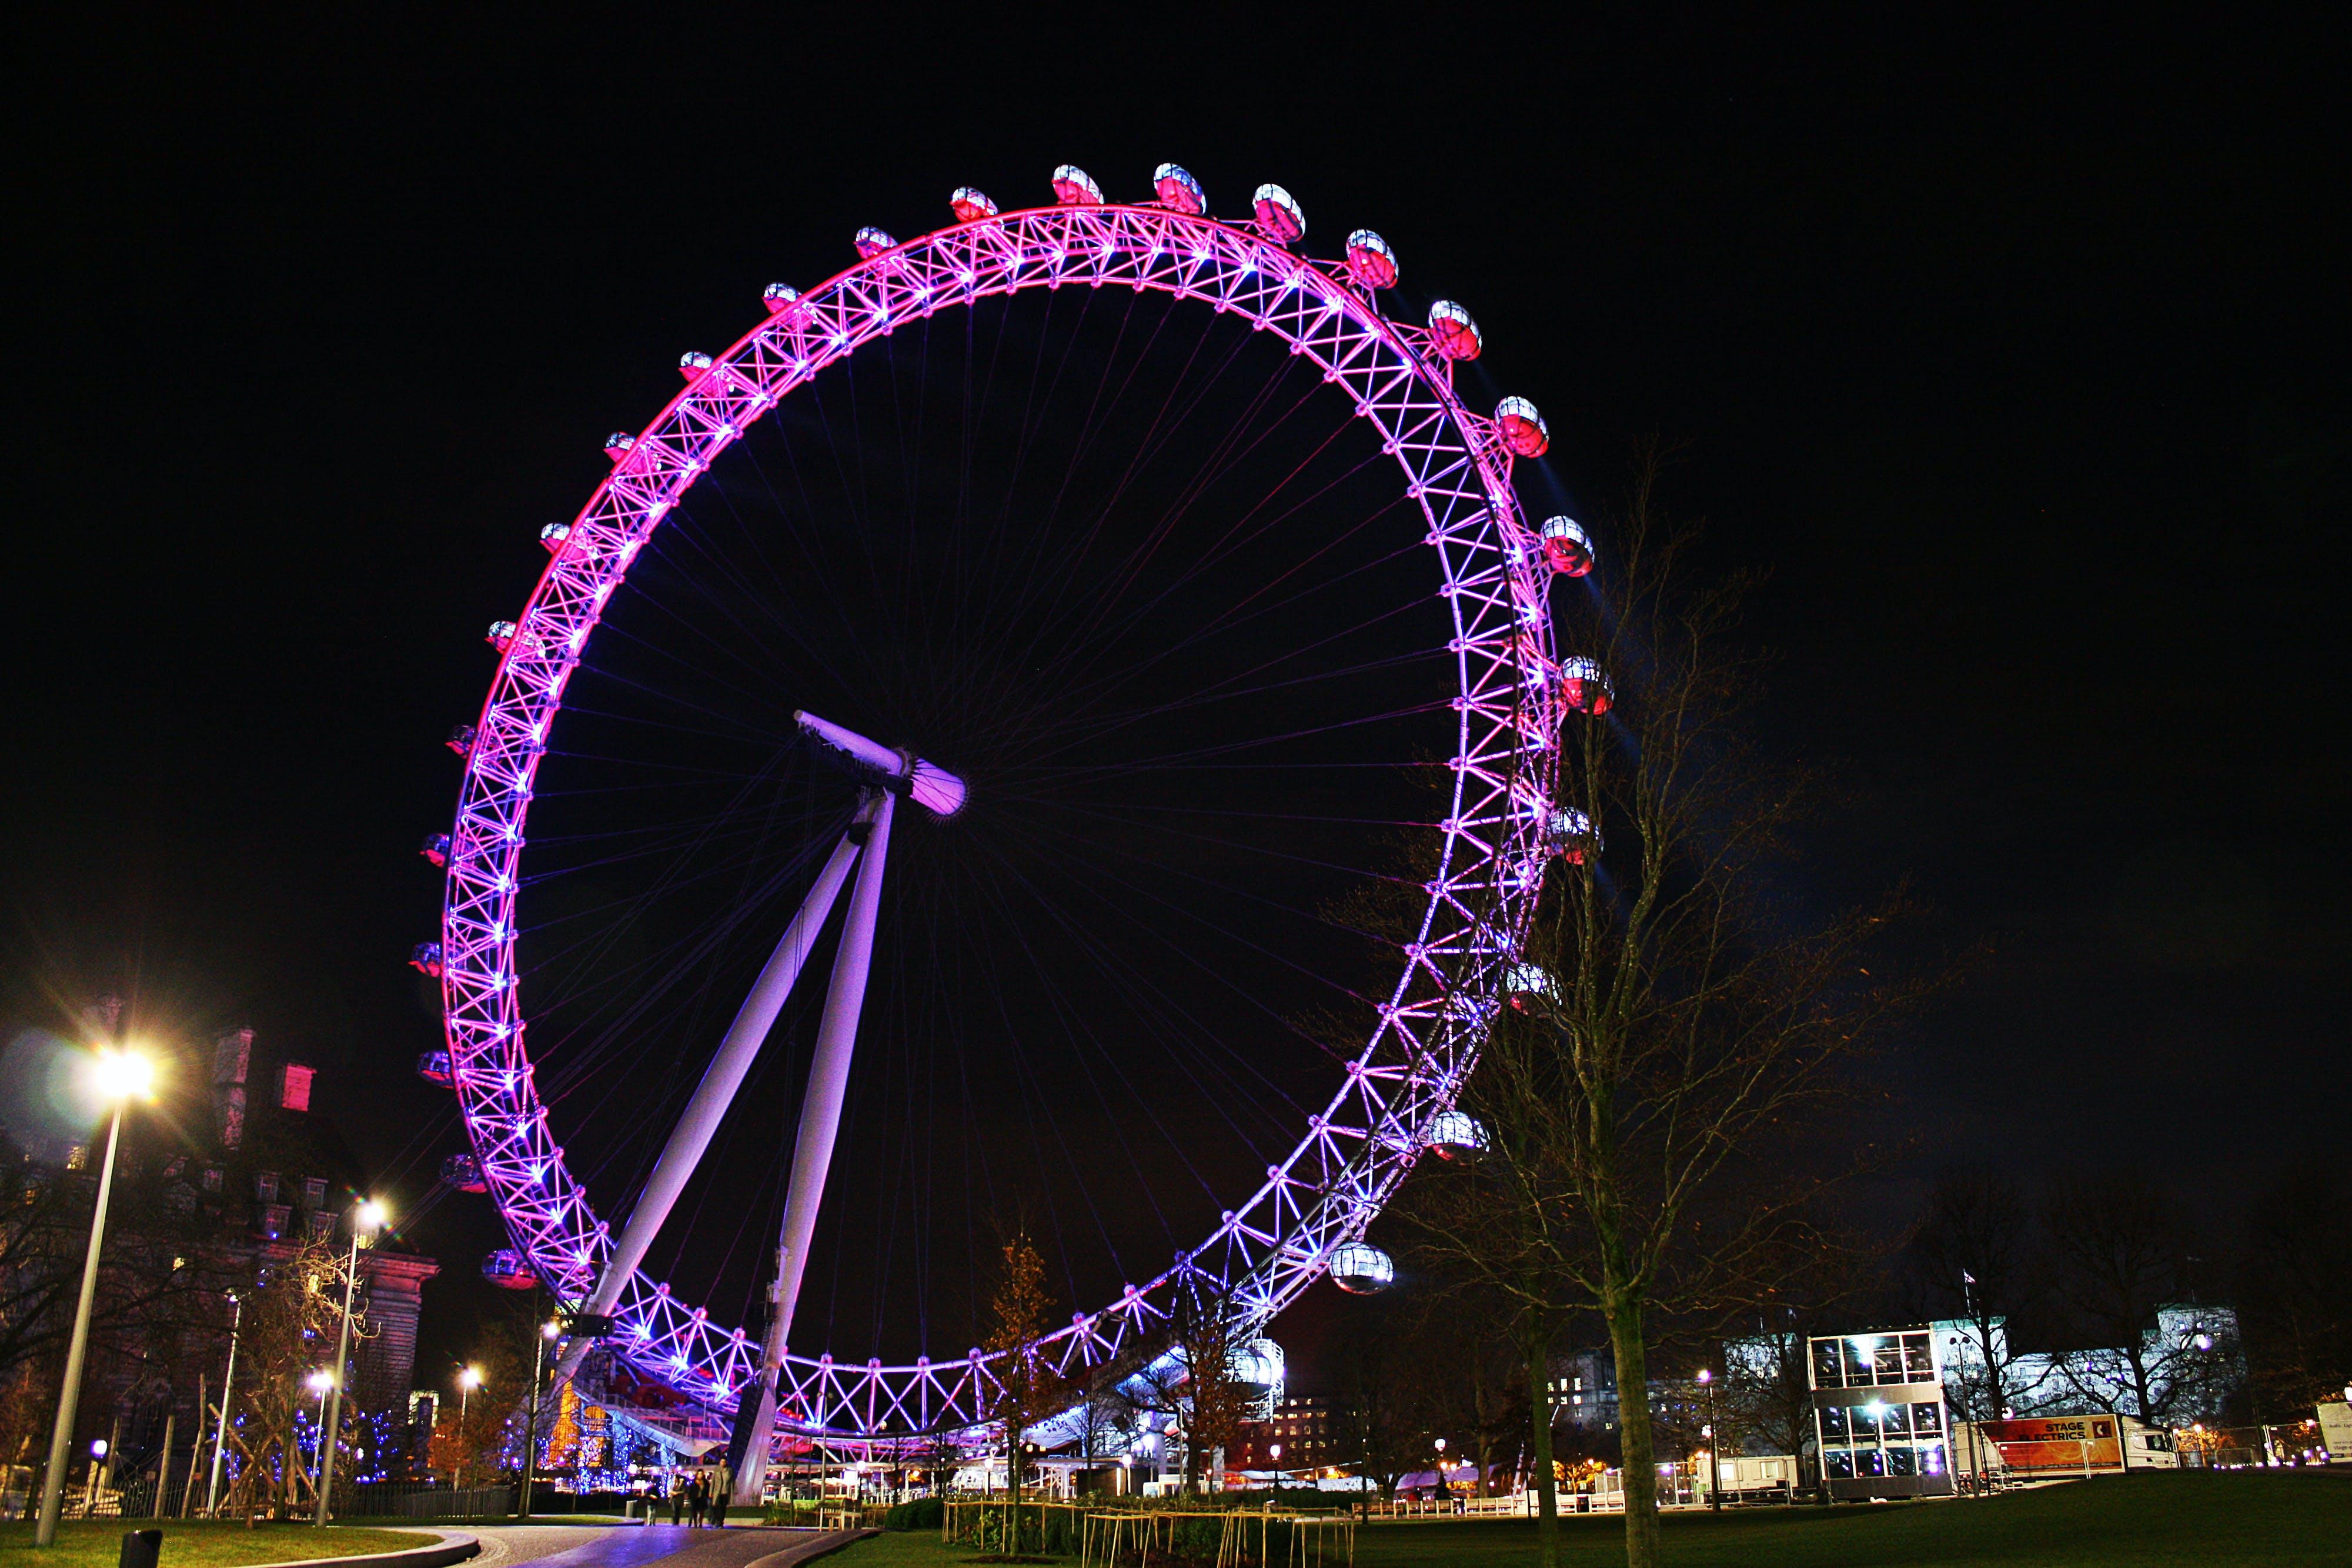 Free stock photo of London UK, Millennium Wheel, giant ferris wheel, The London Eye at night